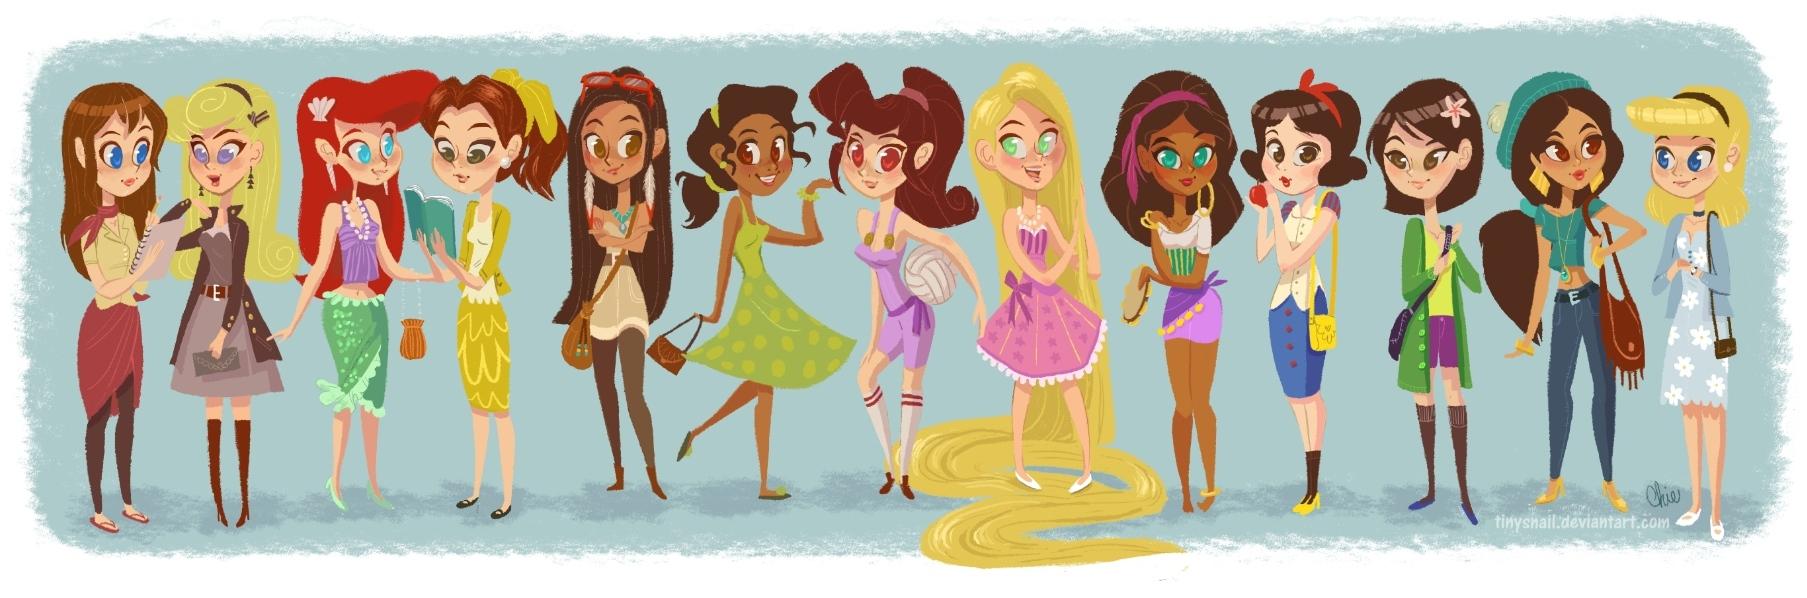 modern disney girls by tinysnail